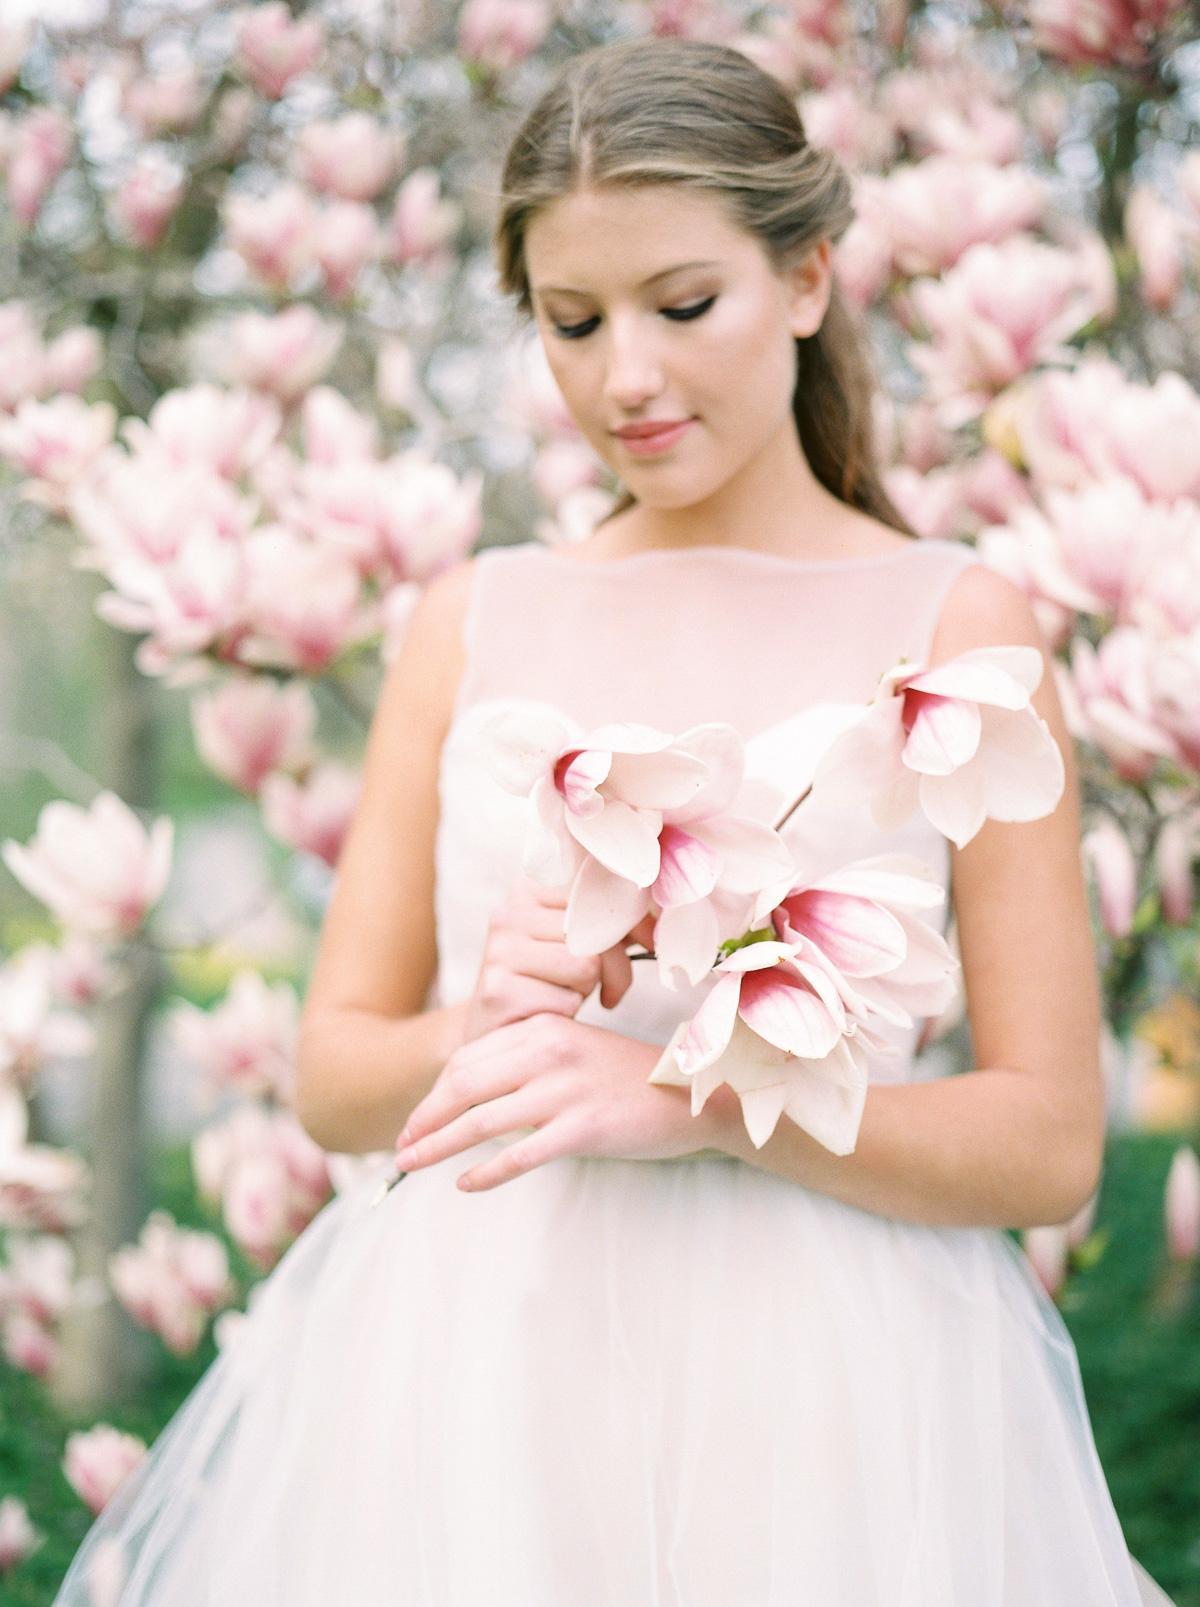 julia-park-photography-vineyard-bride-swish-list-niagara-on-the-lake-wedding-editorial-33.jpg